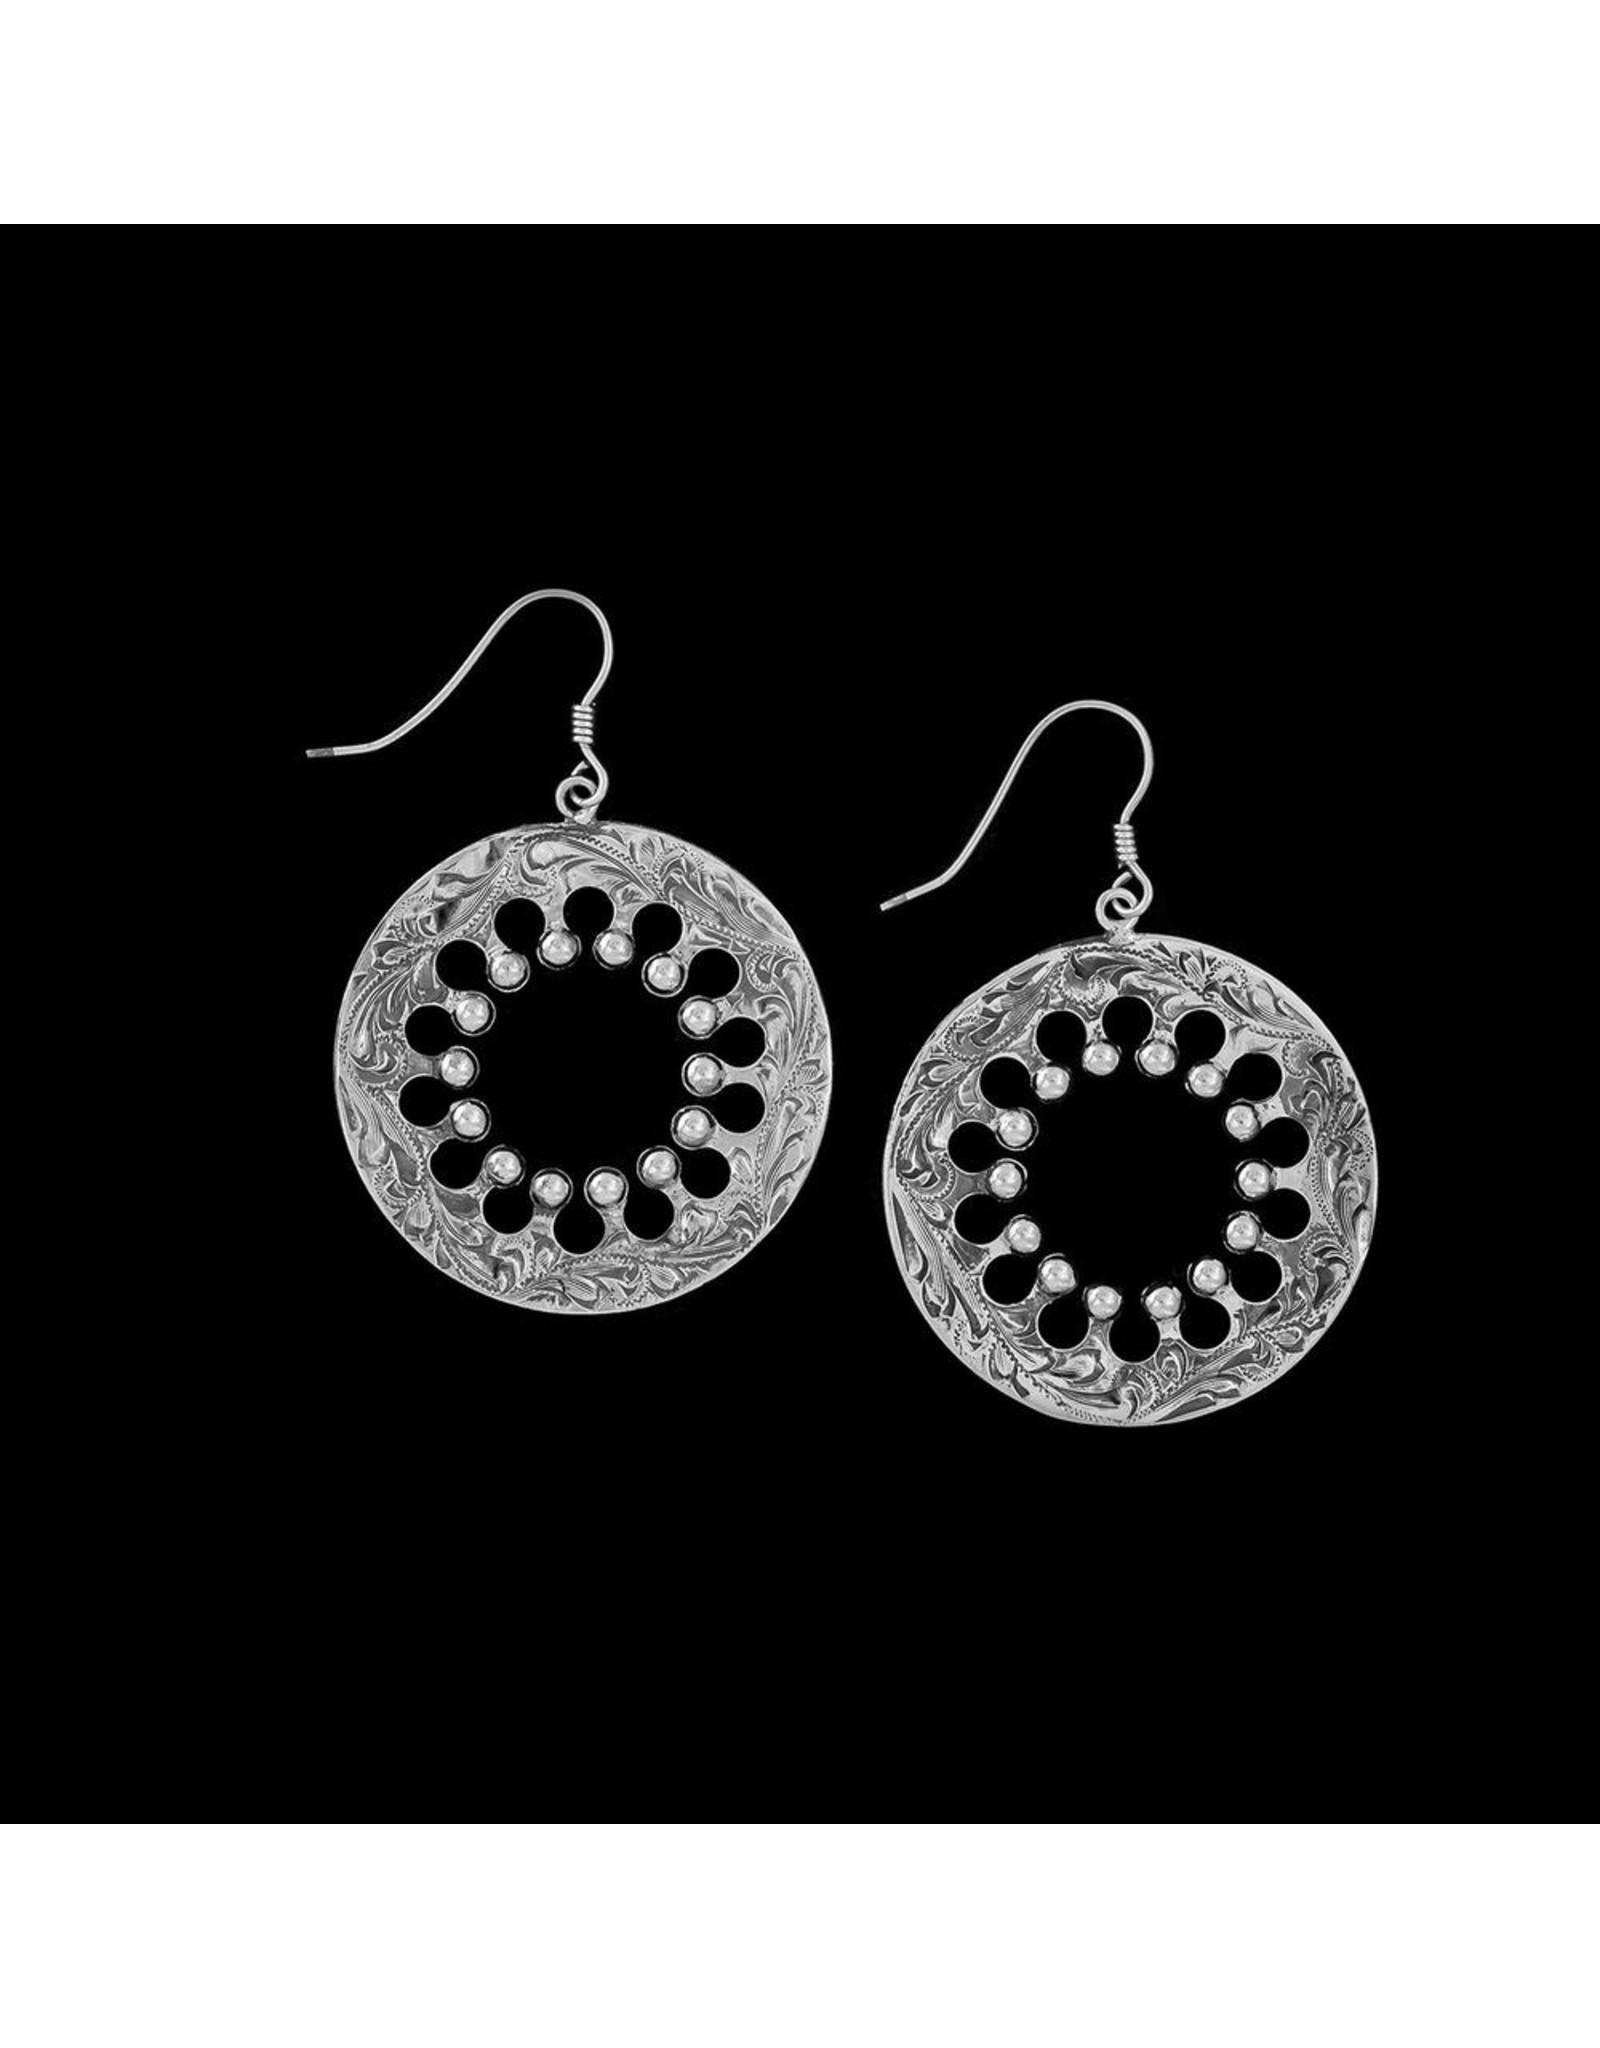 Blair Wagon Wheels Earrings